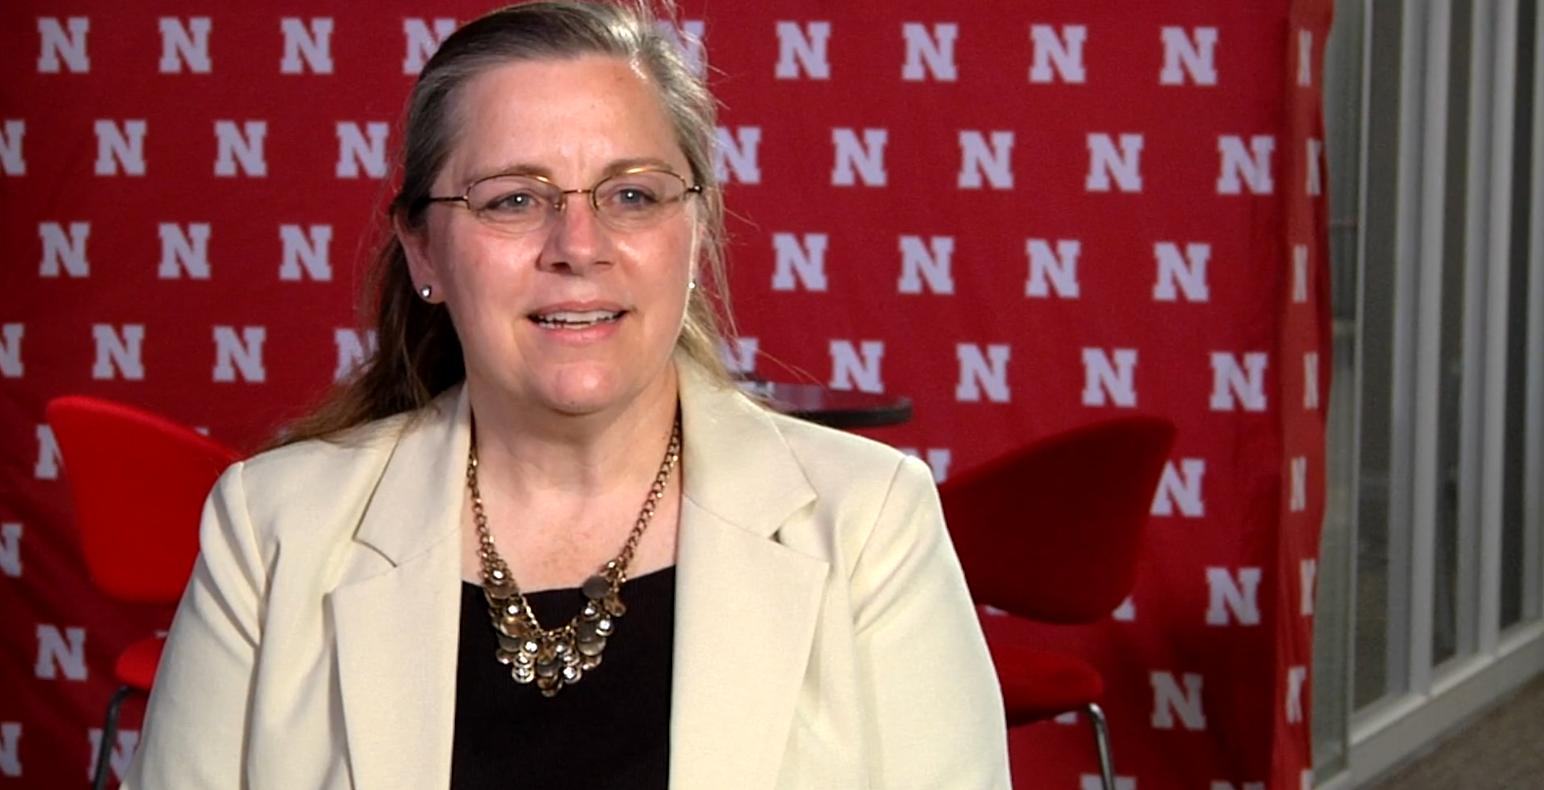 She's a Scientist: Karen Stelling